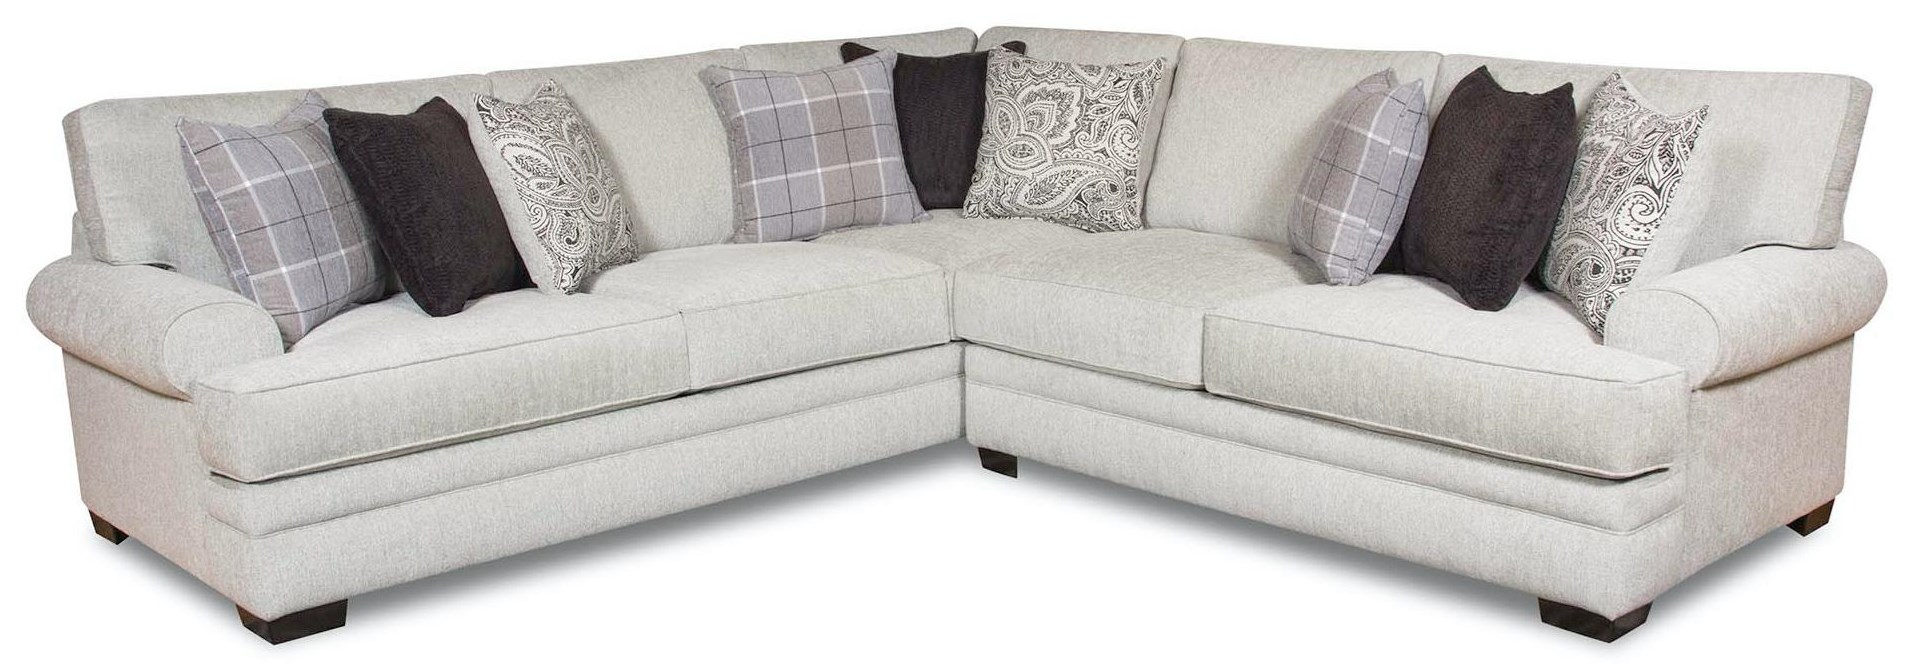 4-Seat Sectional Sofa